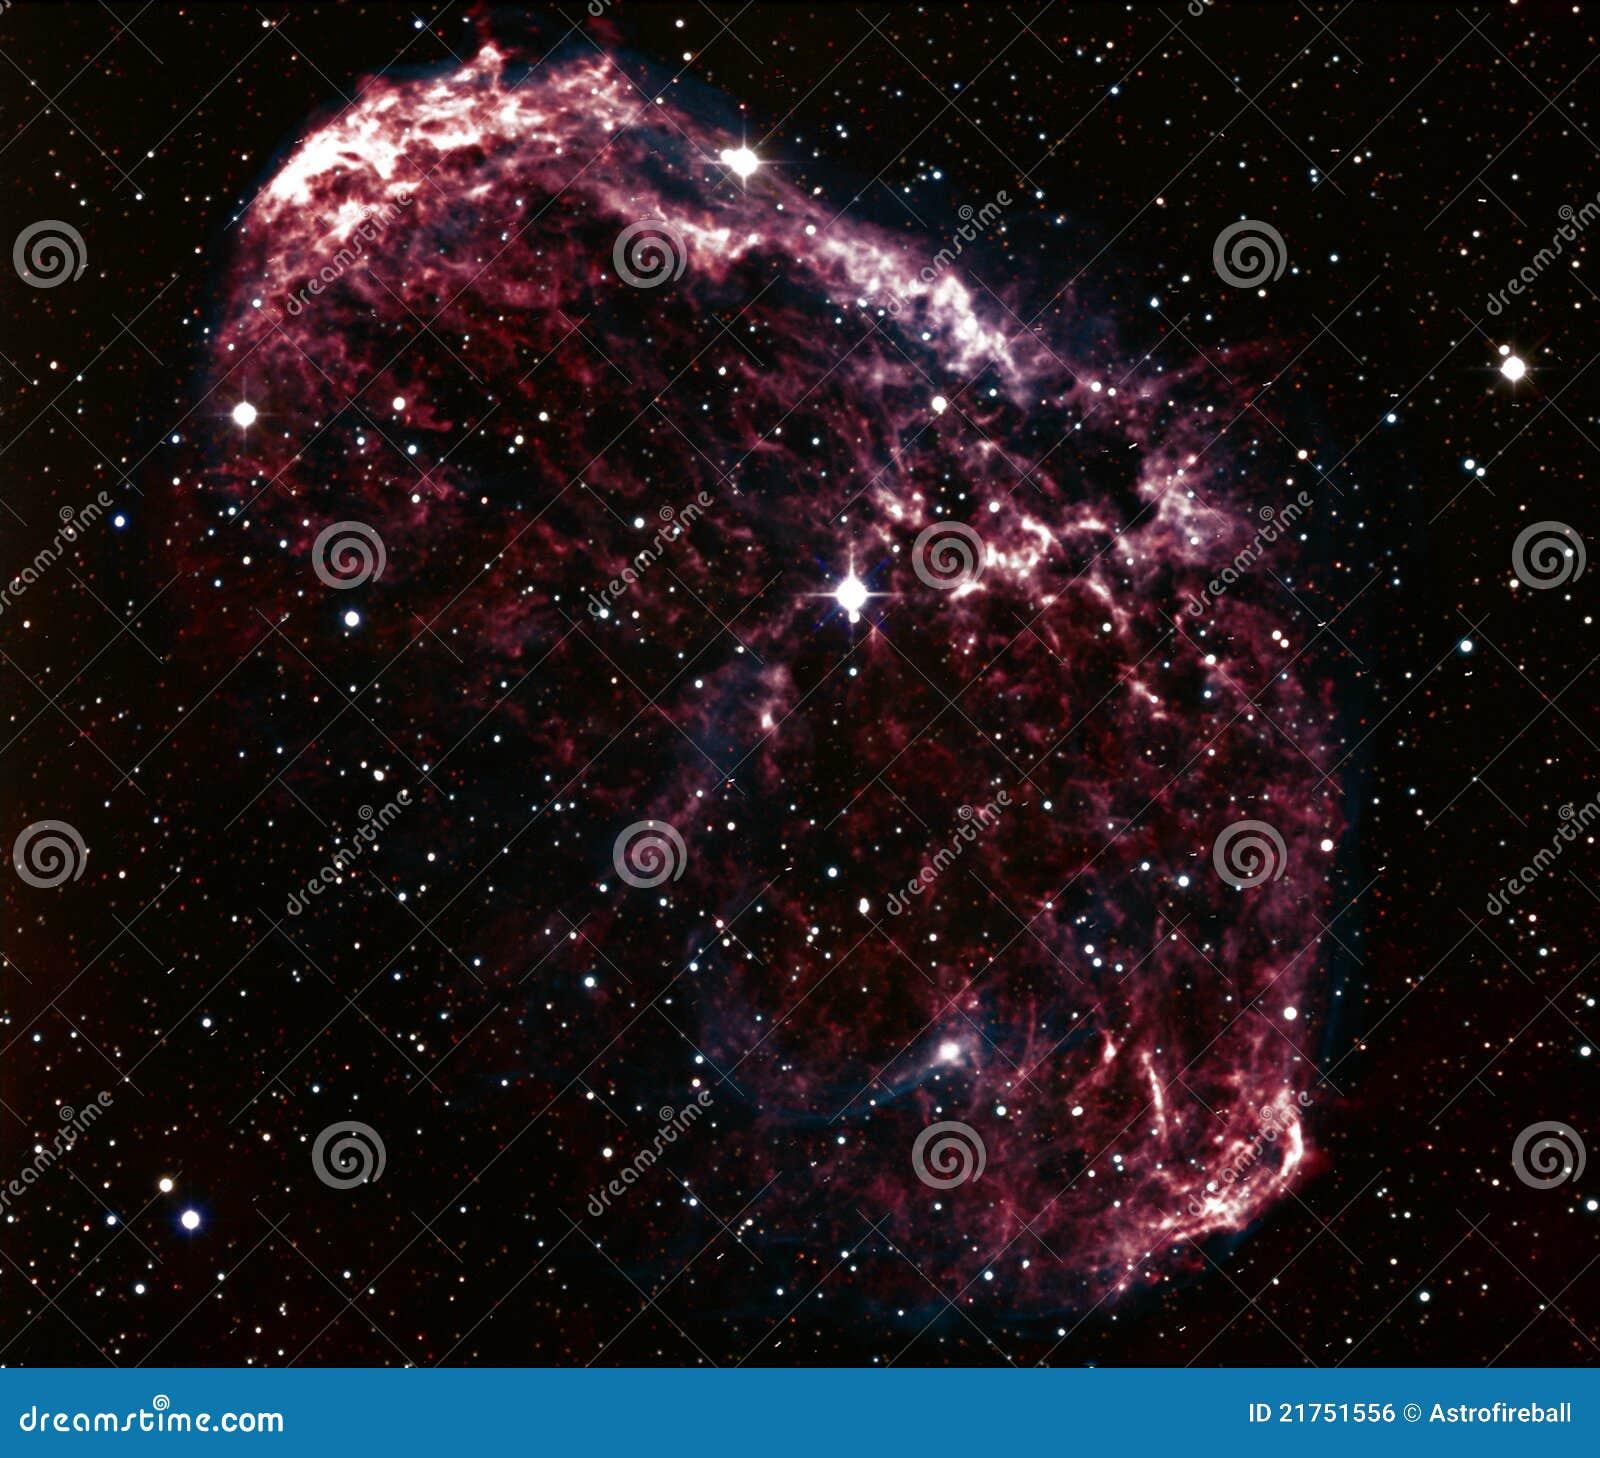 Medusa nebula, NGC 6888